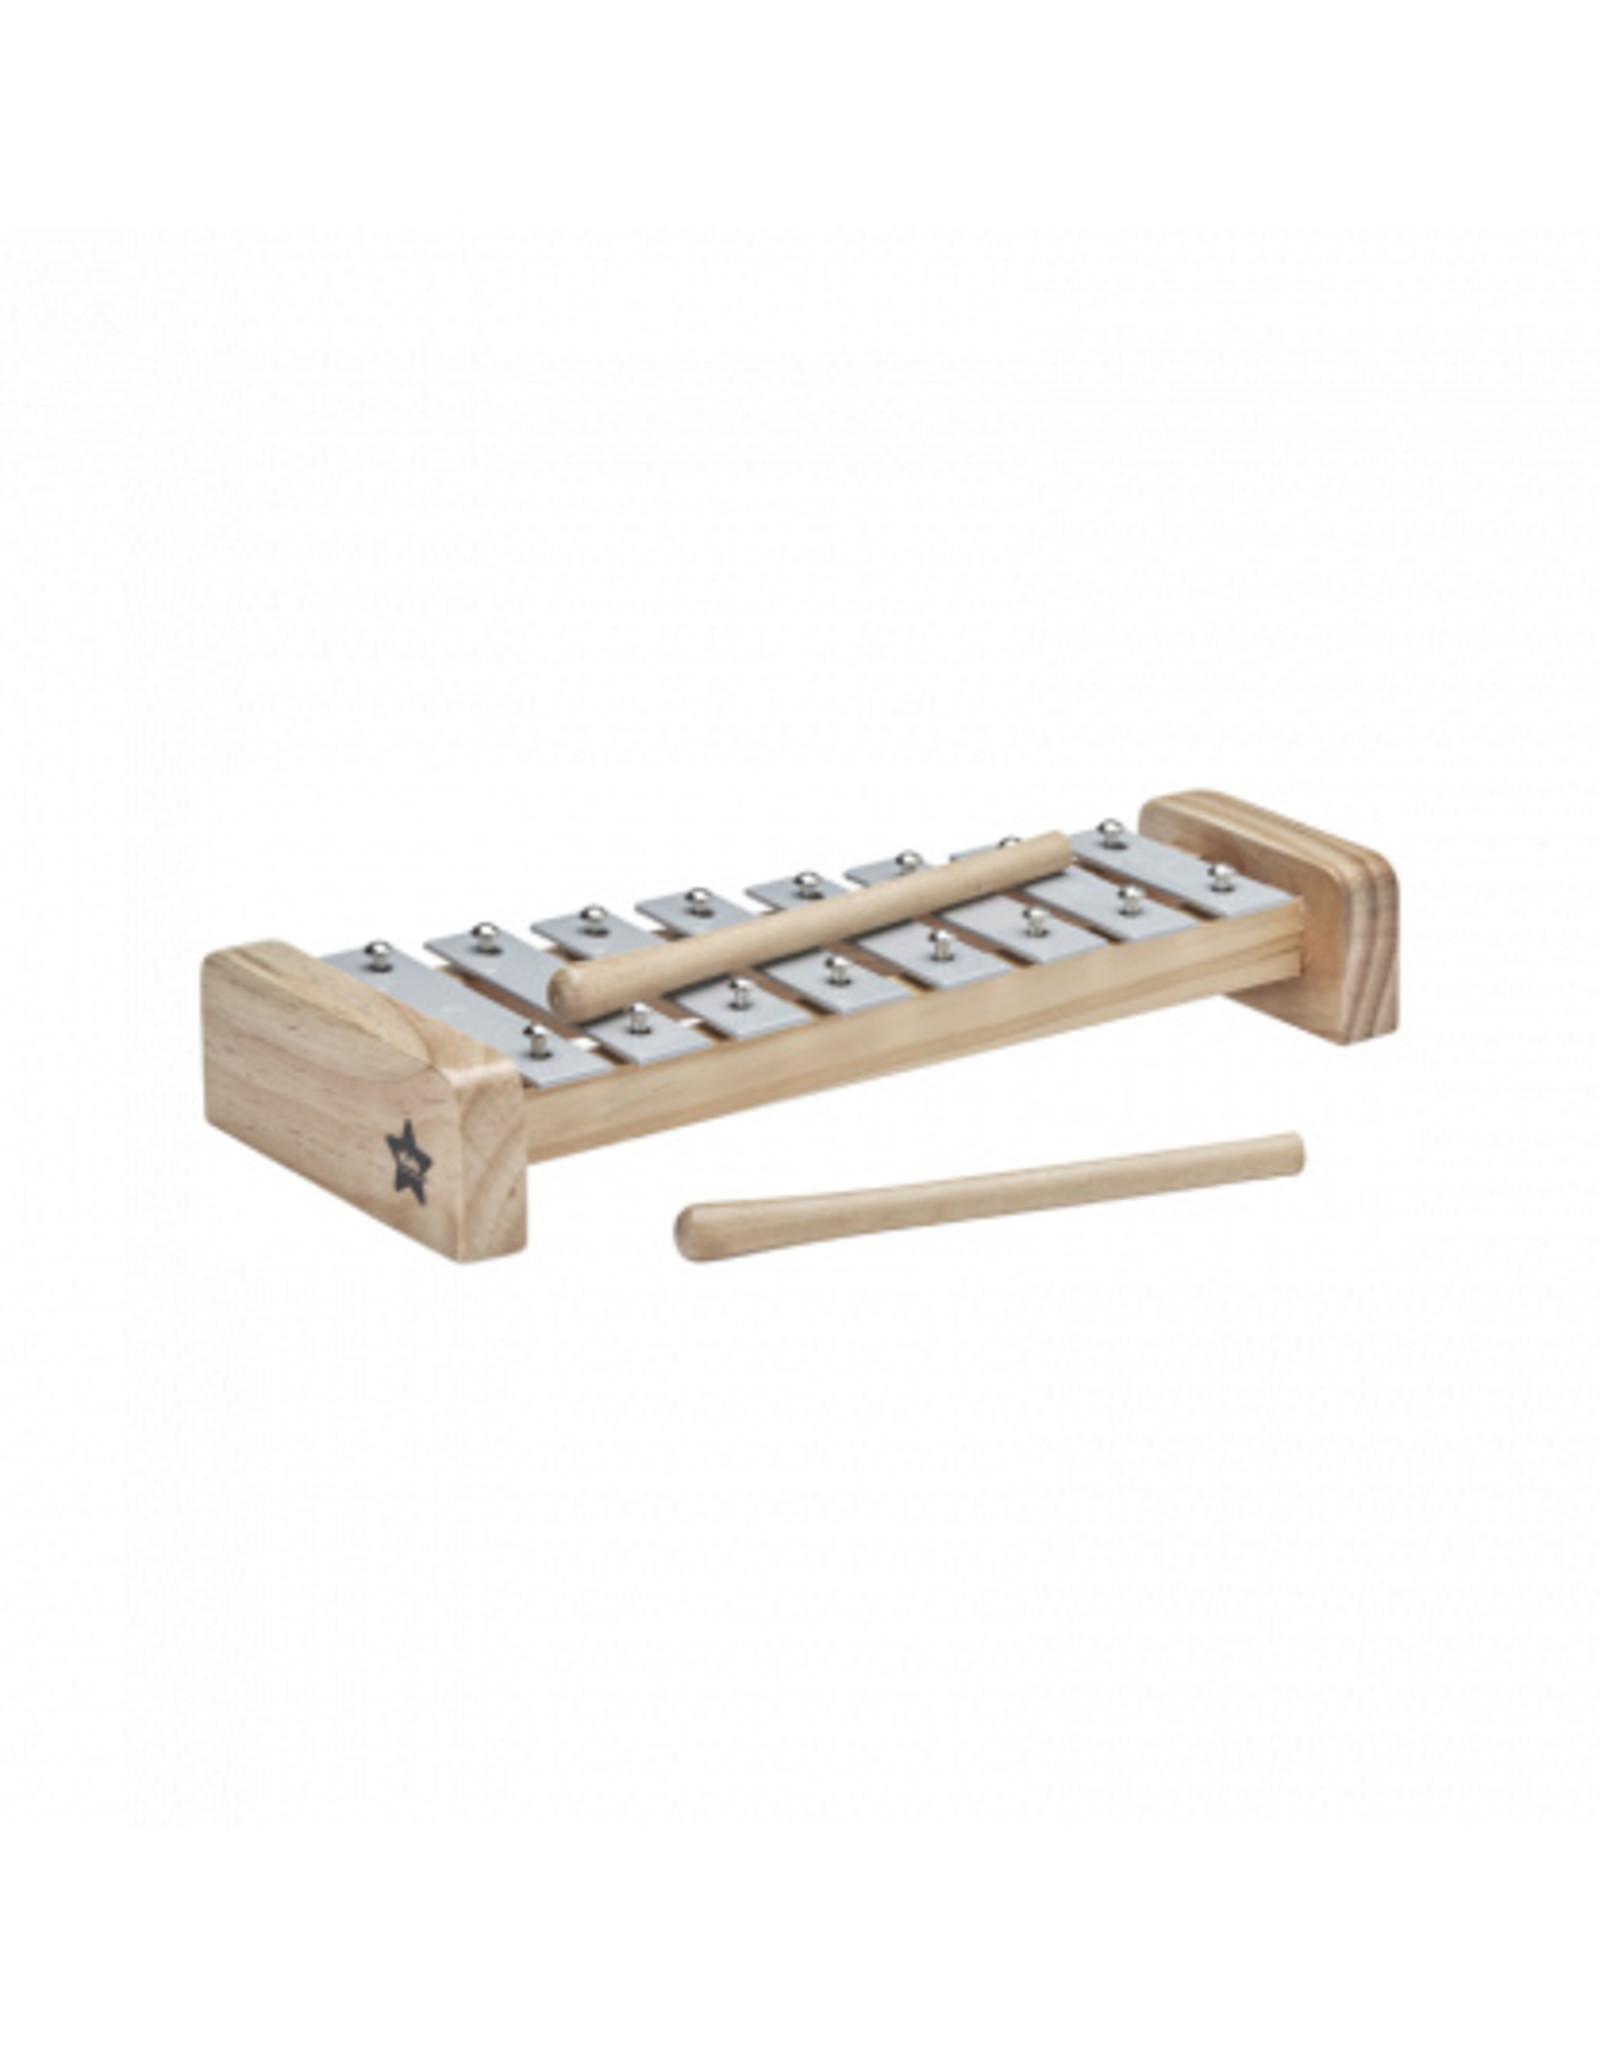 KIDS CONCEPT Xylophone